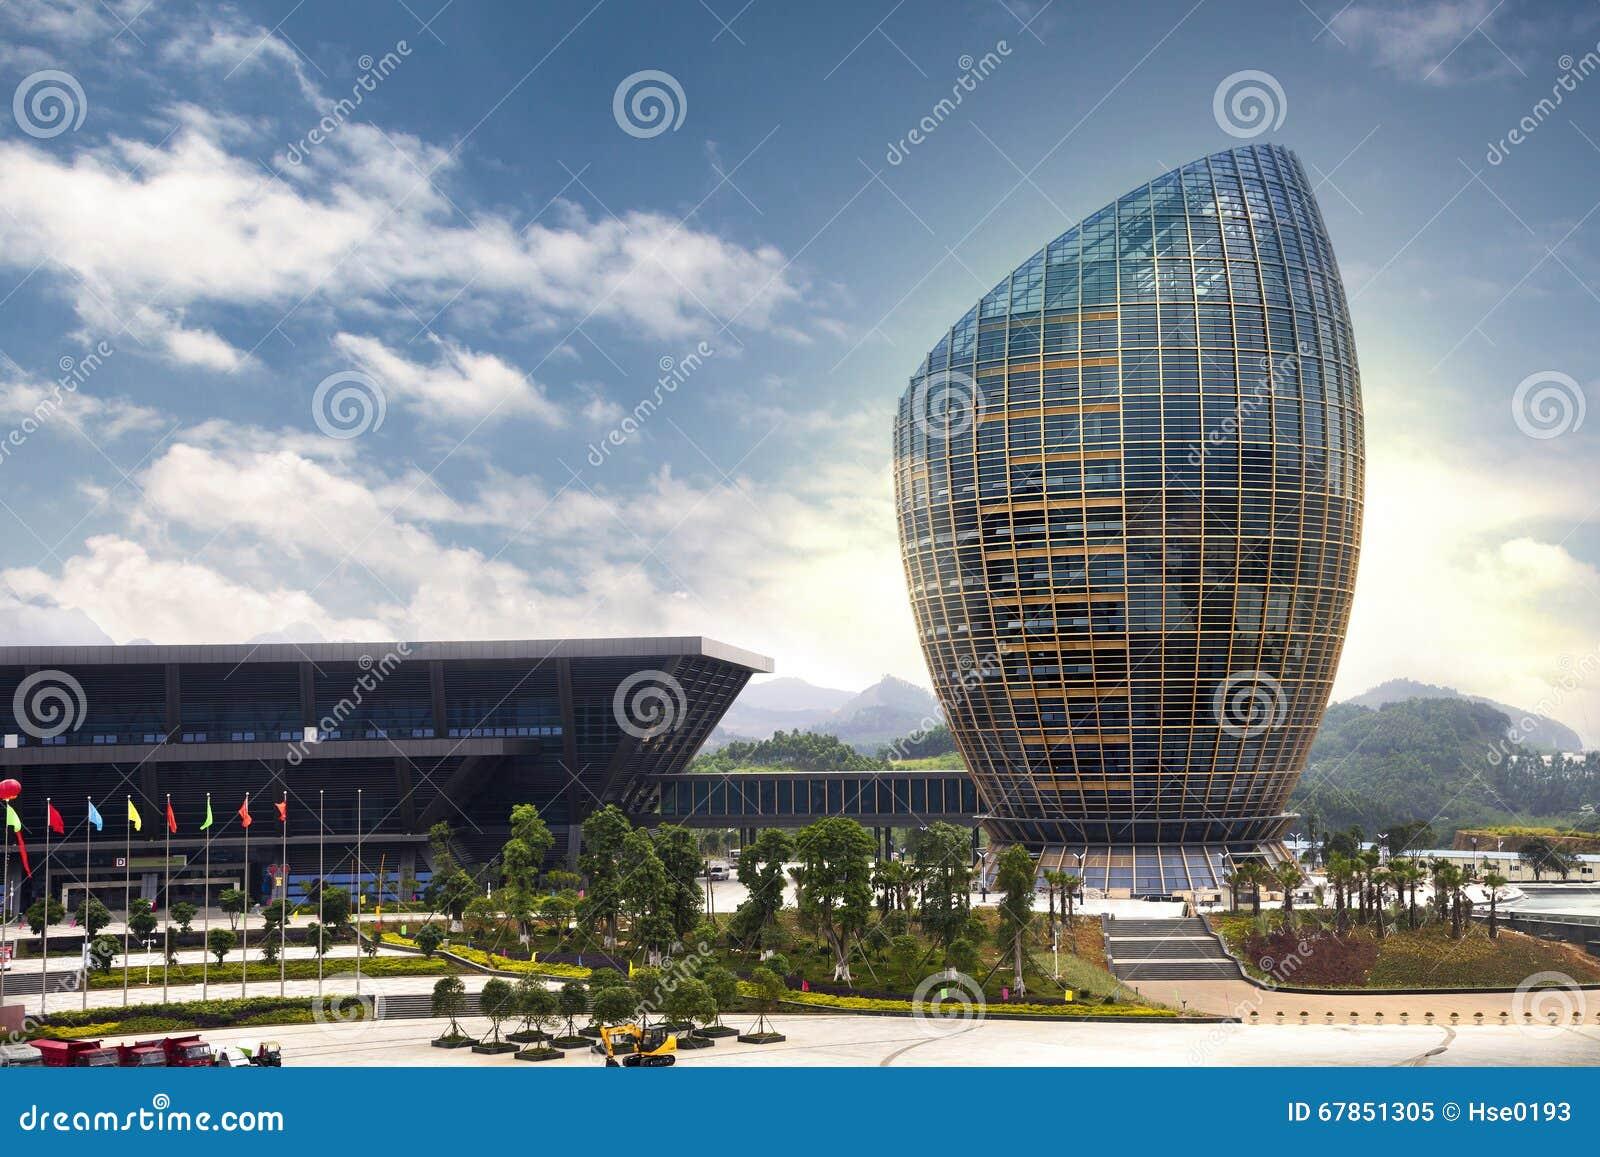 Liuzhou International Convention and Exhibition Center